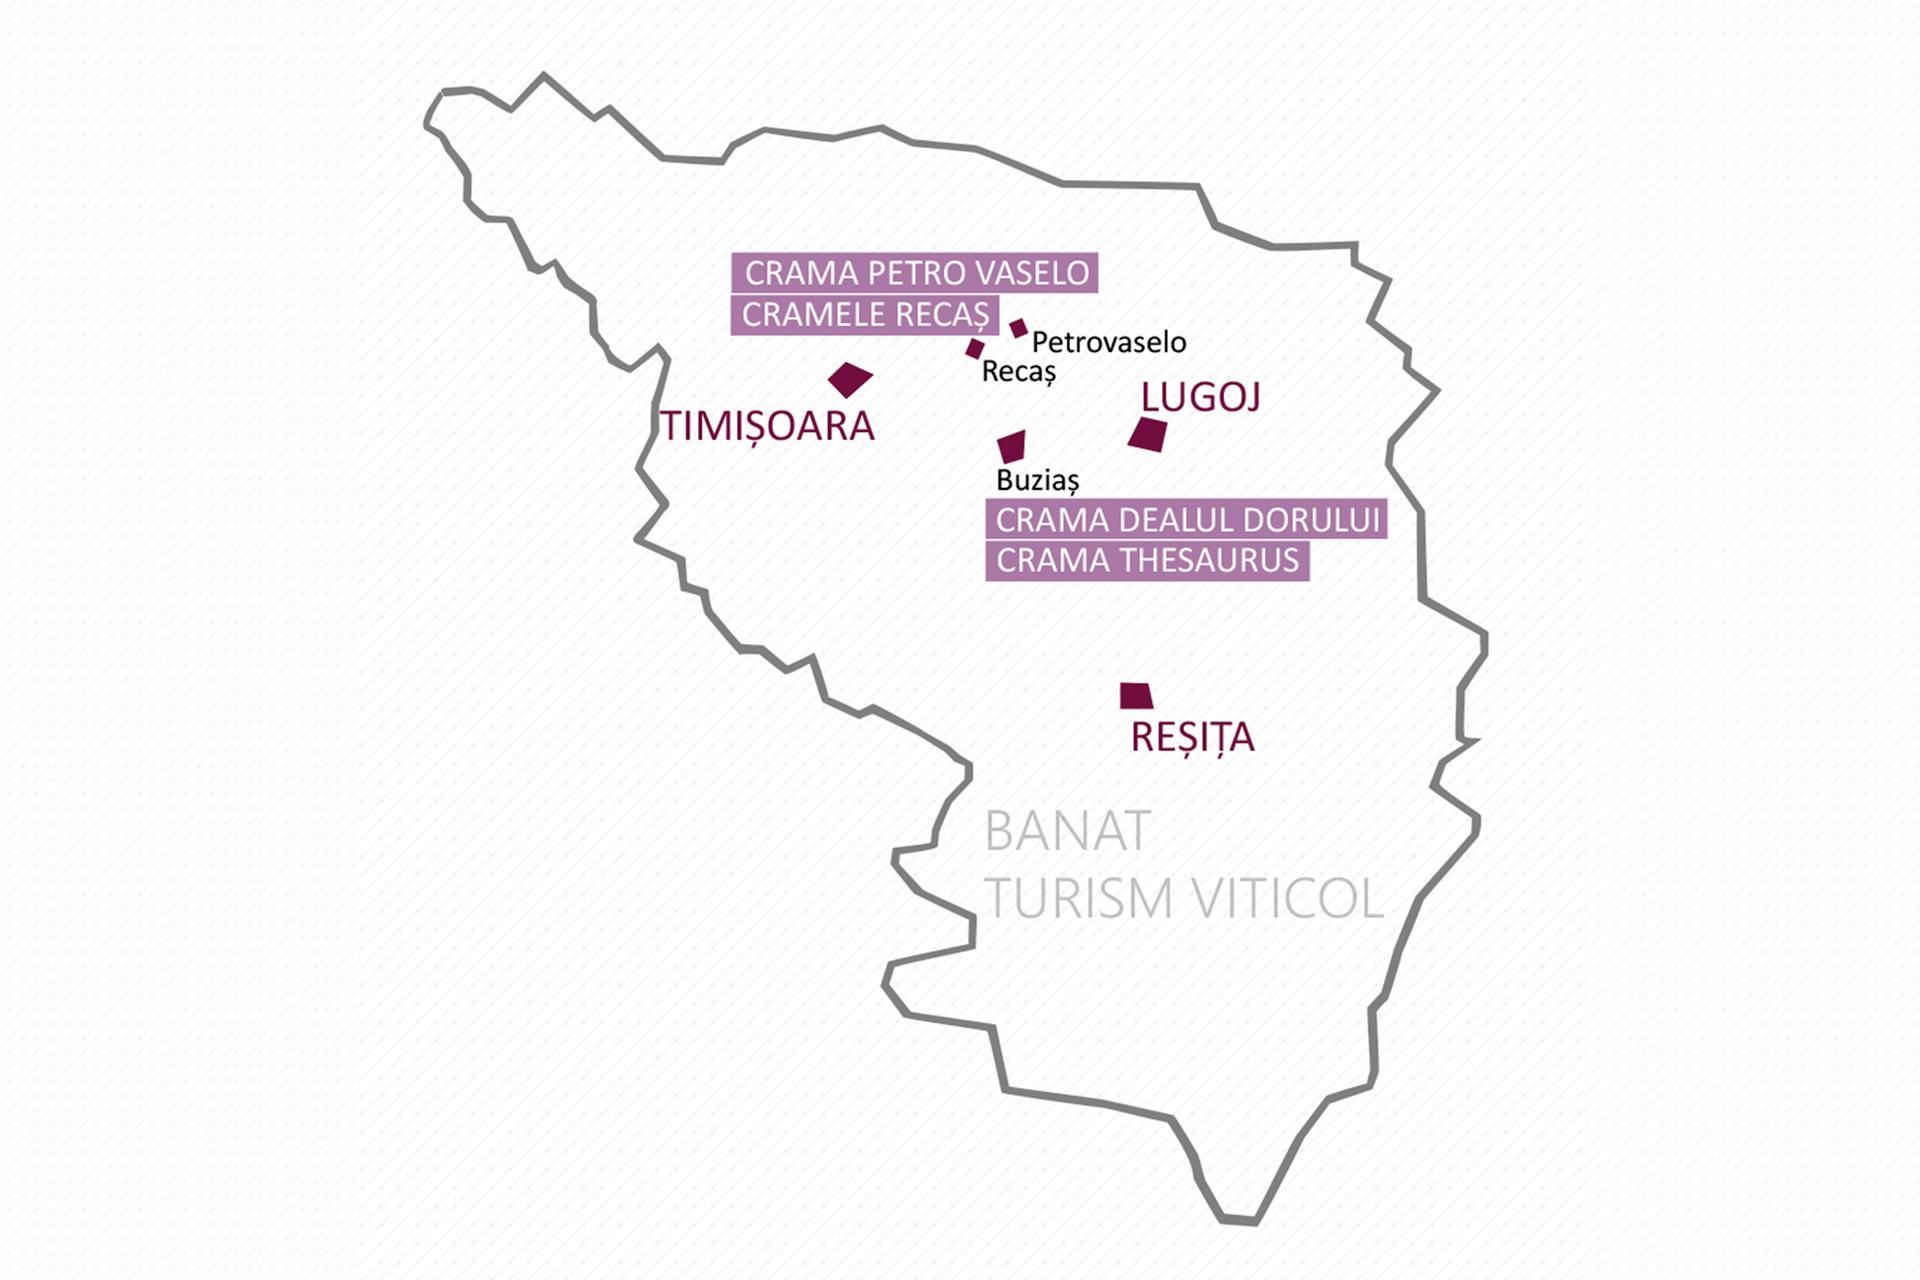 banat_turism_viticol_România_cavaleria_ro